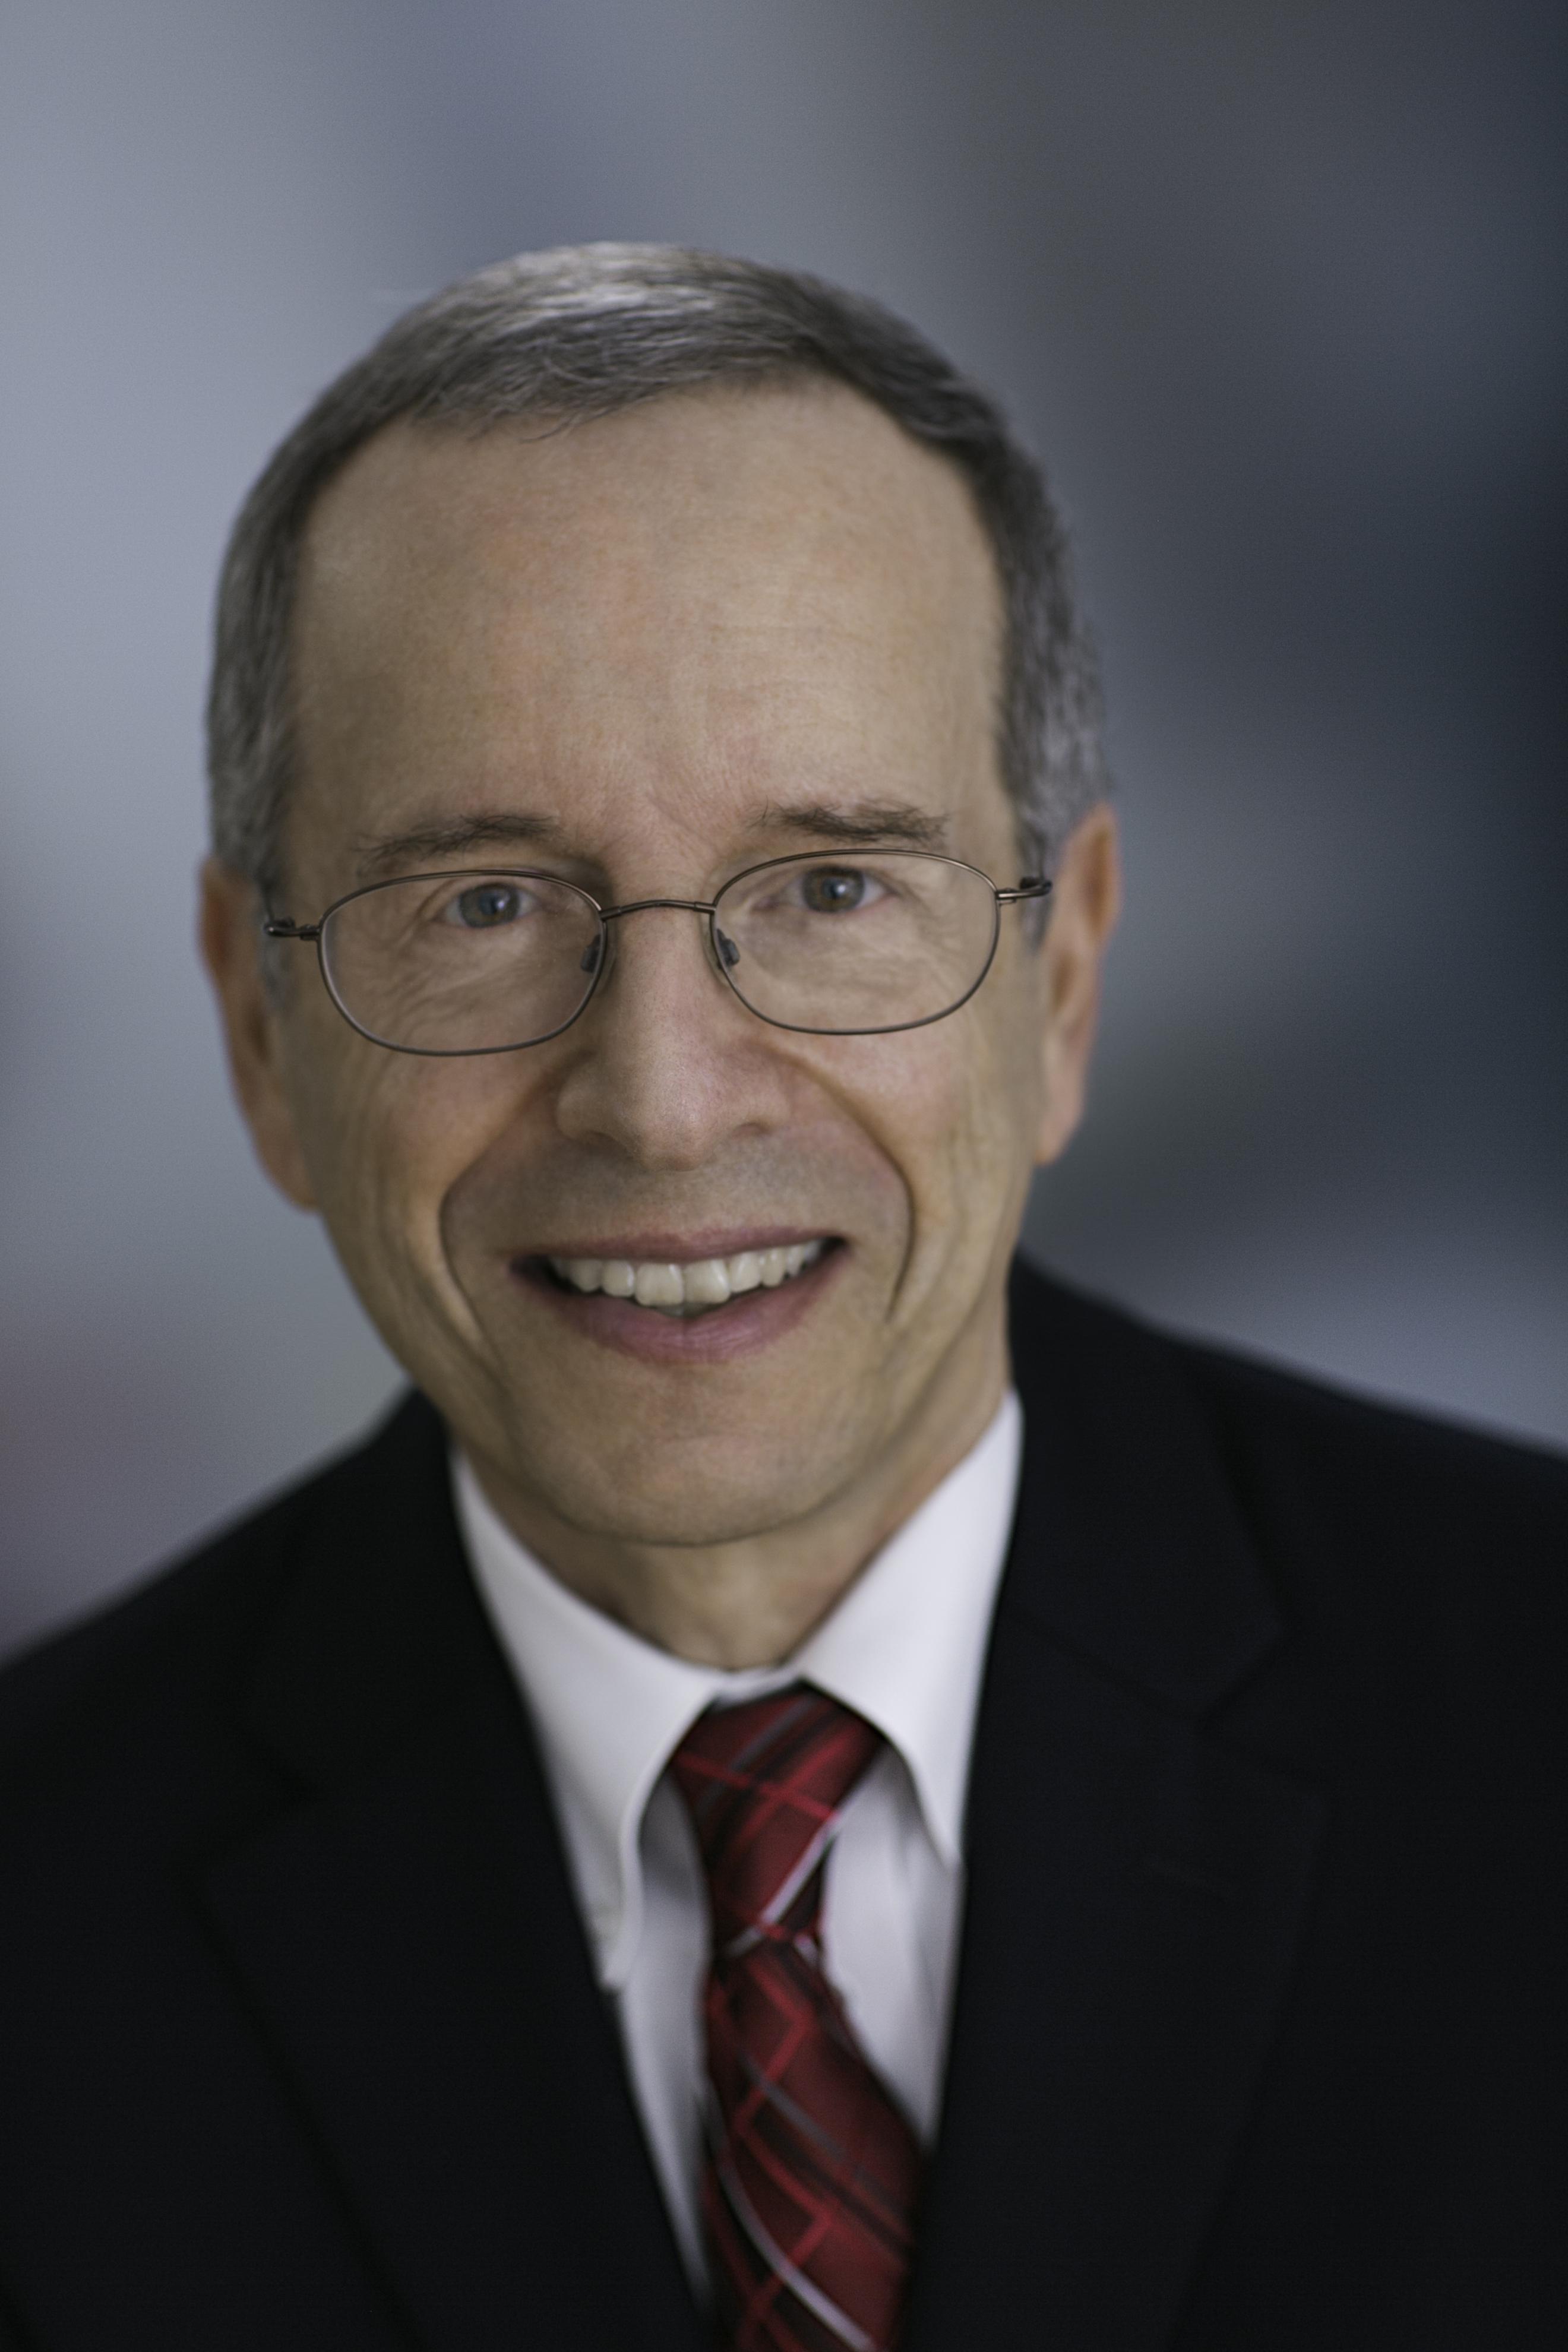 Michael Schudson